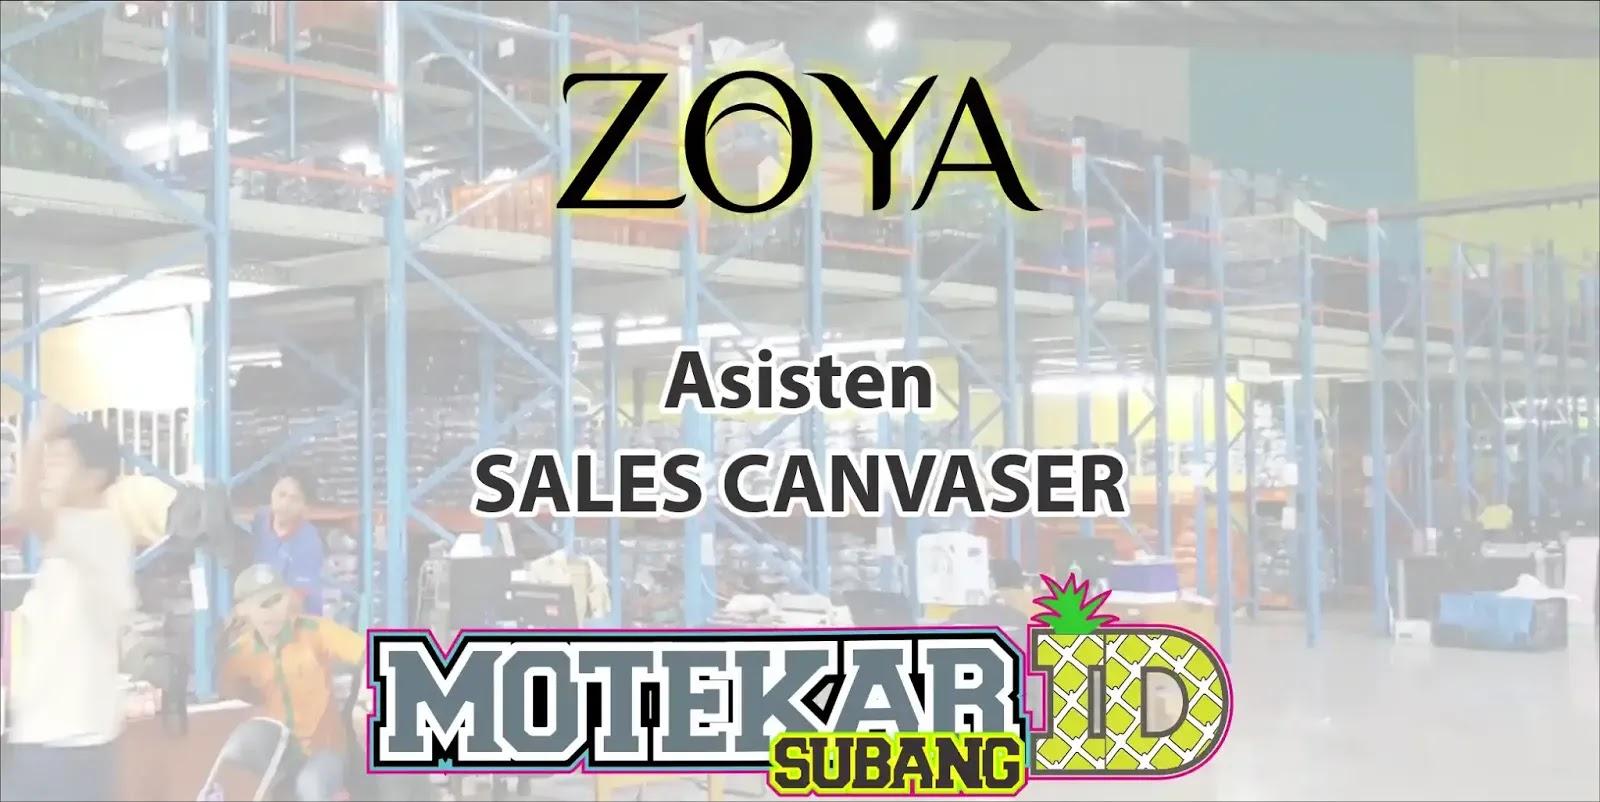 Lowongan Kerja Asisten Sales Canvasing Zoya Shafco Bandung